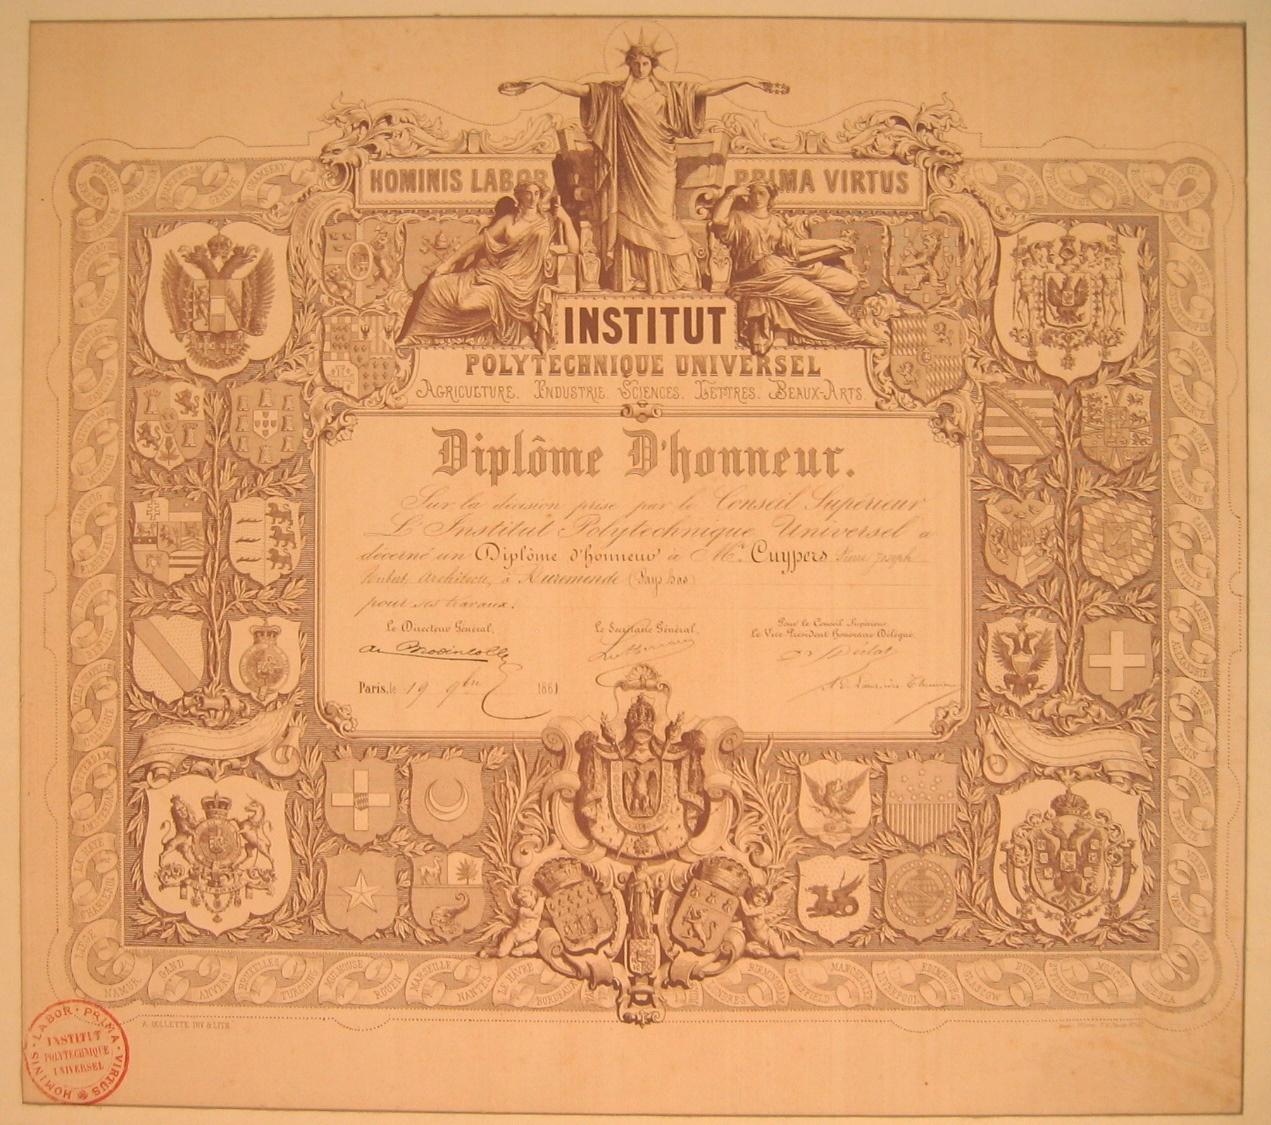 Diplôme d'Honneur van het Institut Polytechnique te Parijs voor P.J.H. Cuypers